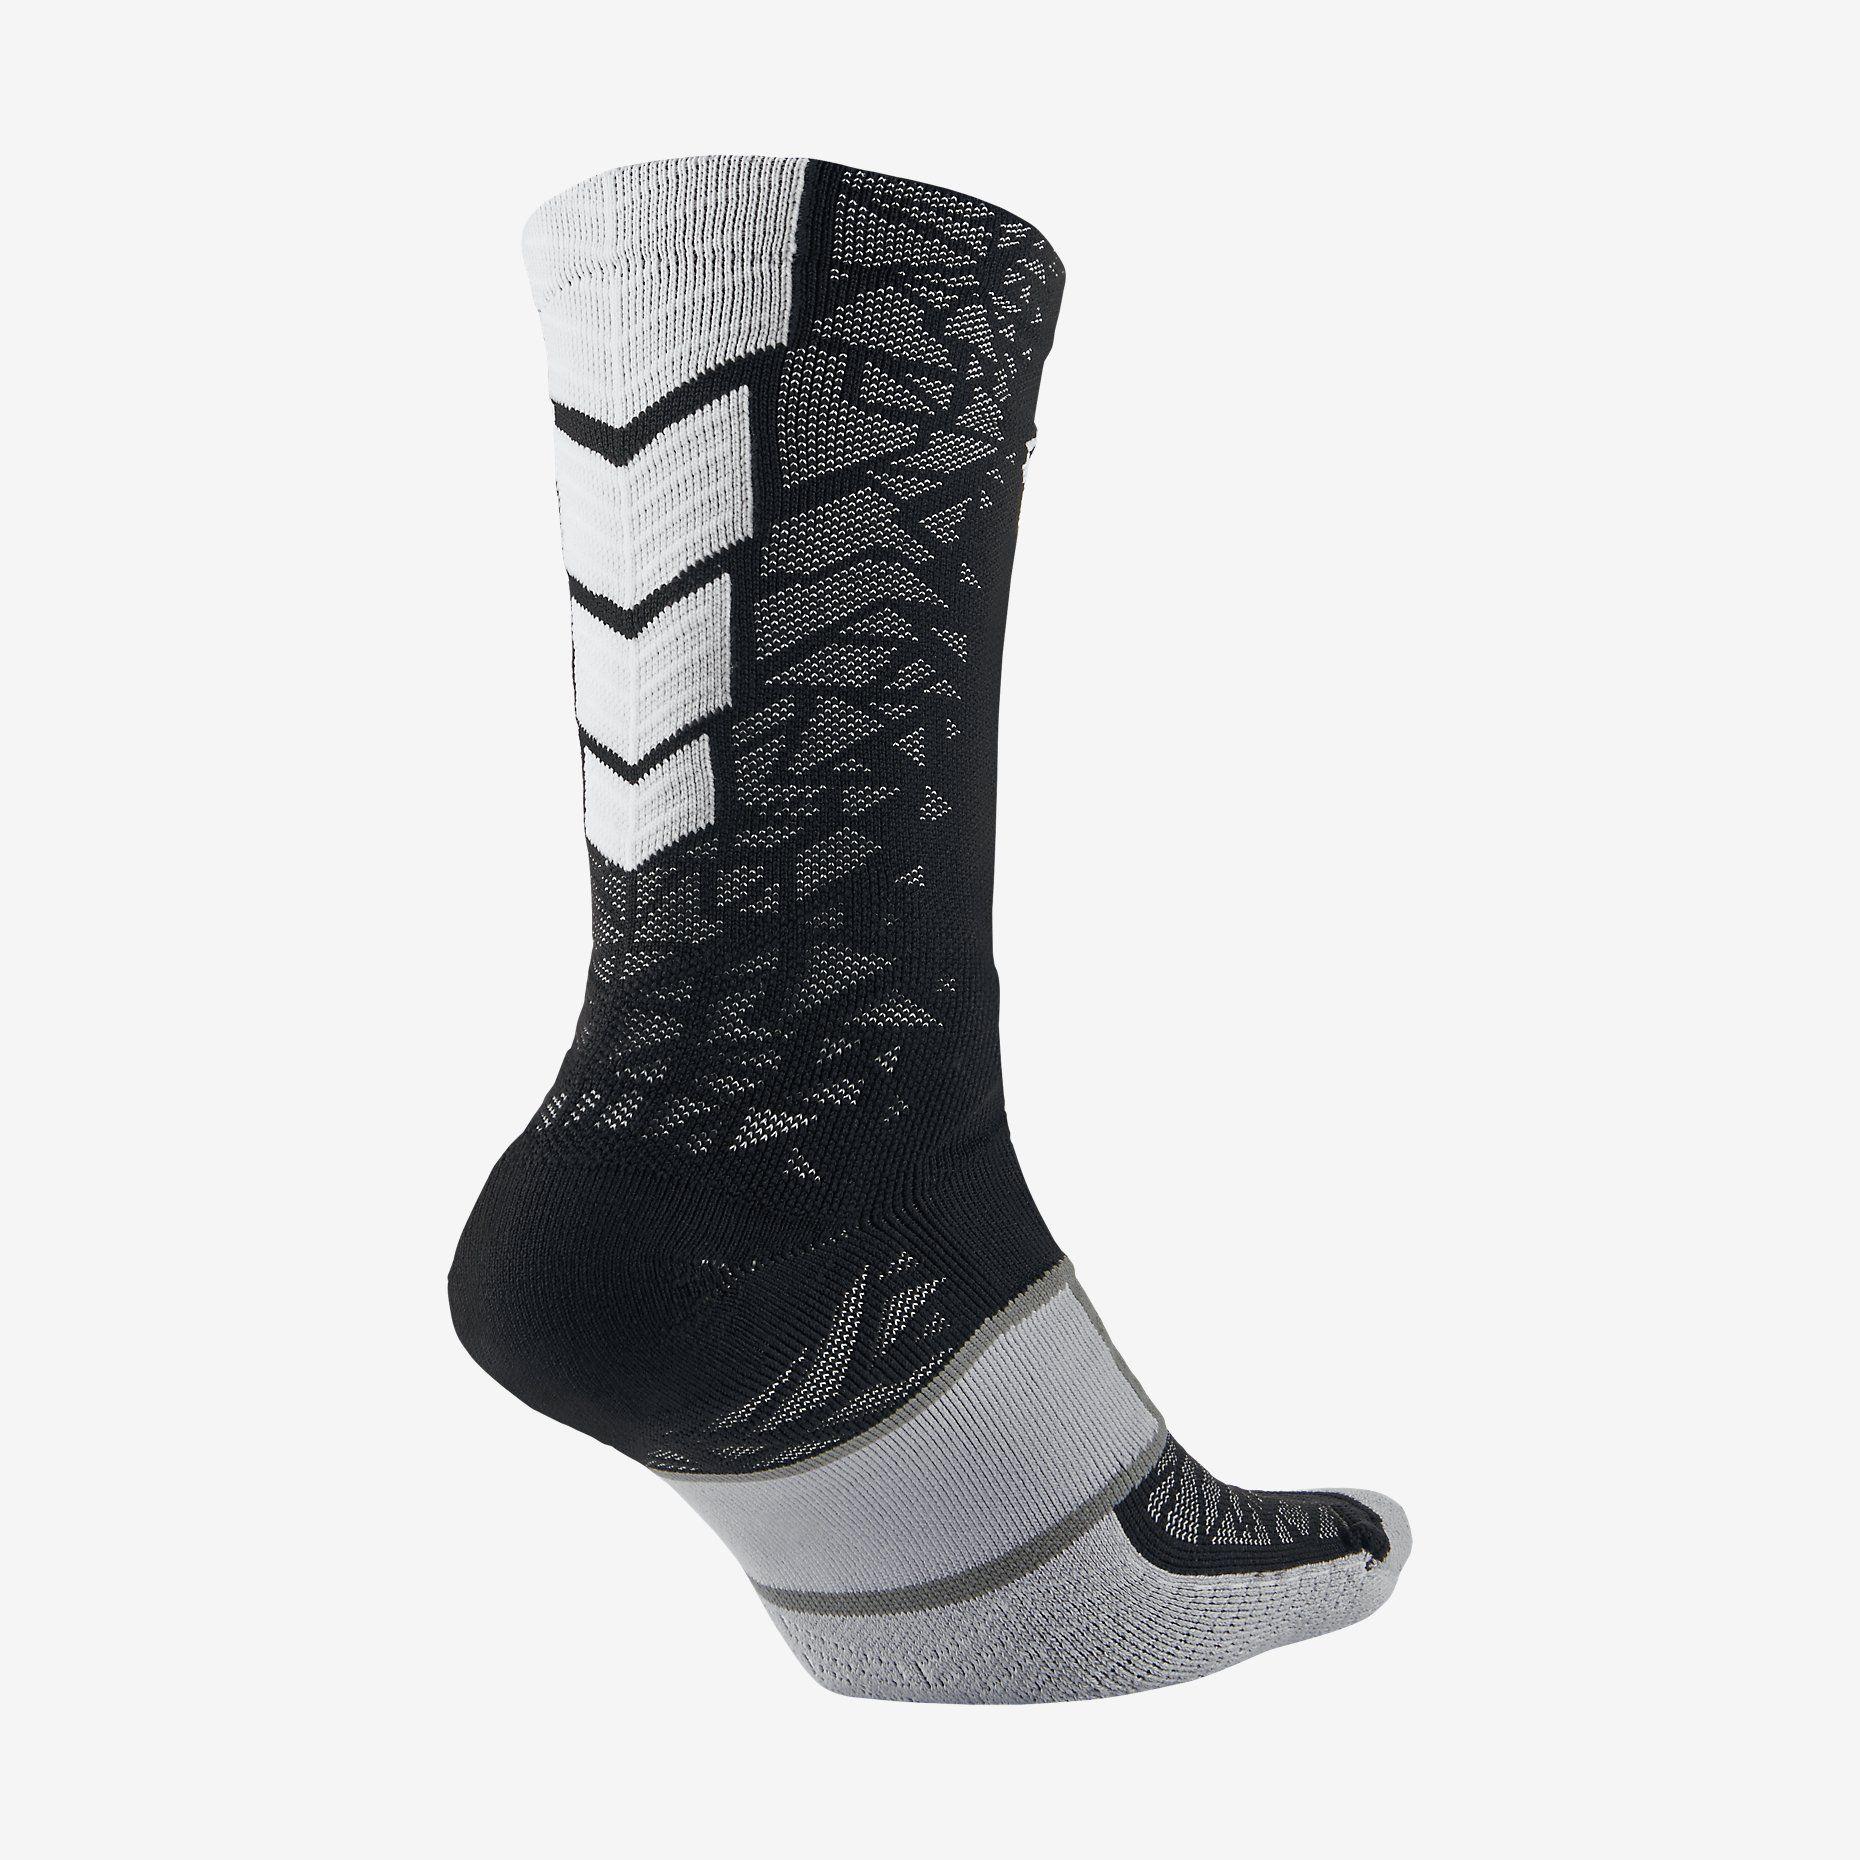 Nike Match Fit Elite Hypervenom Crew Black/White Soccer Socks